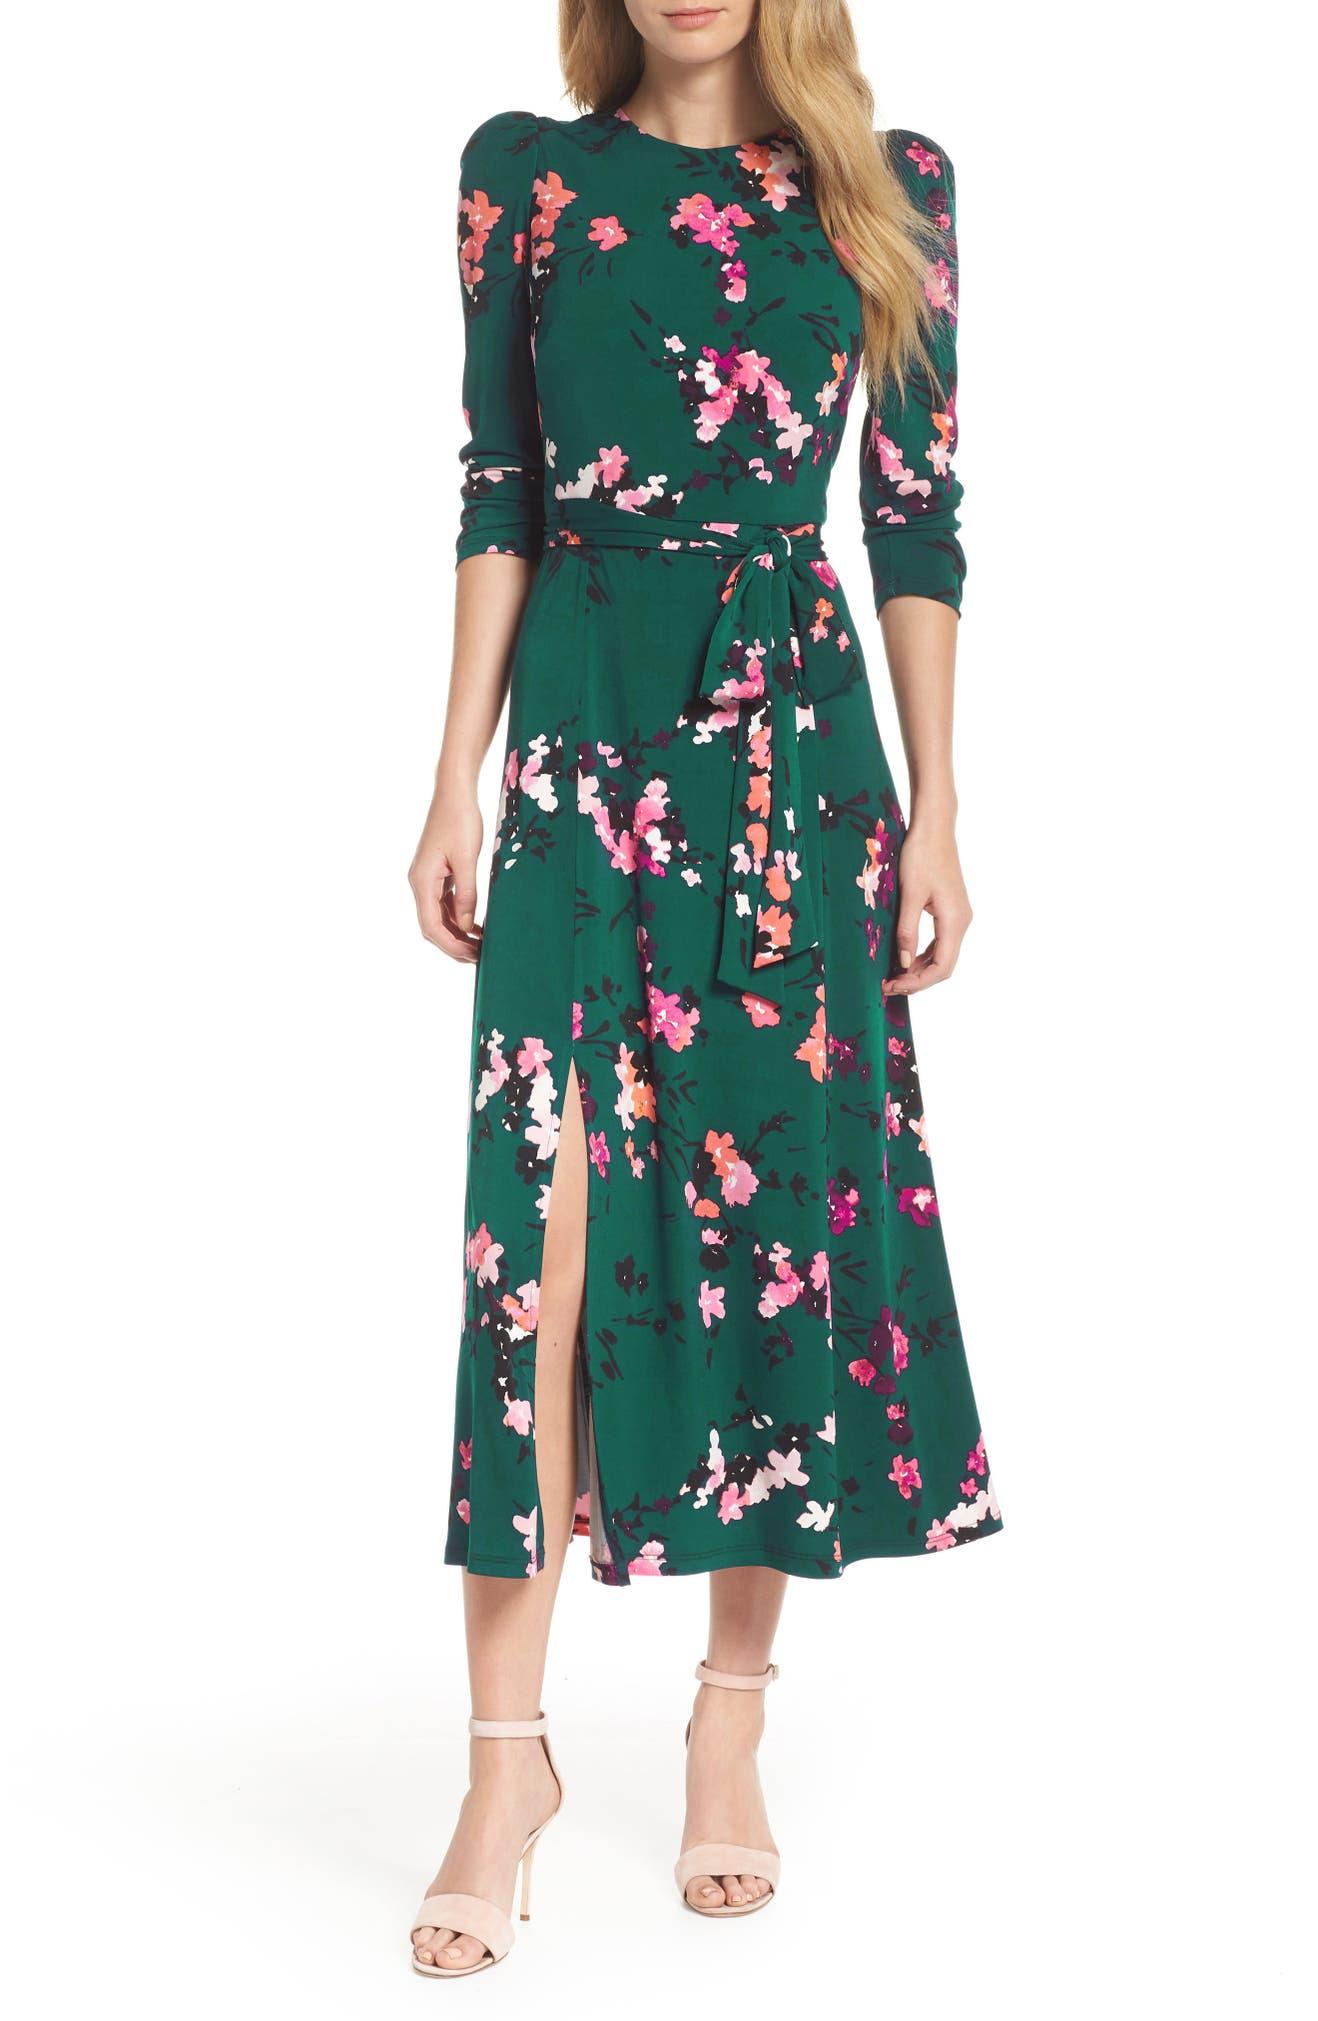 green floral spring wedding guest dress